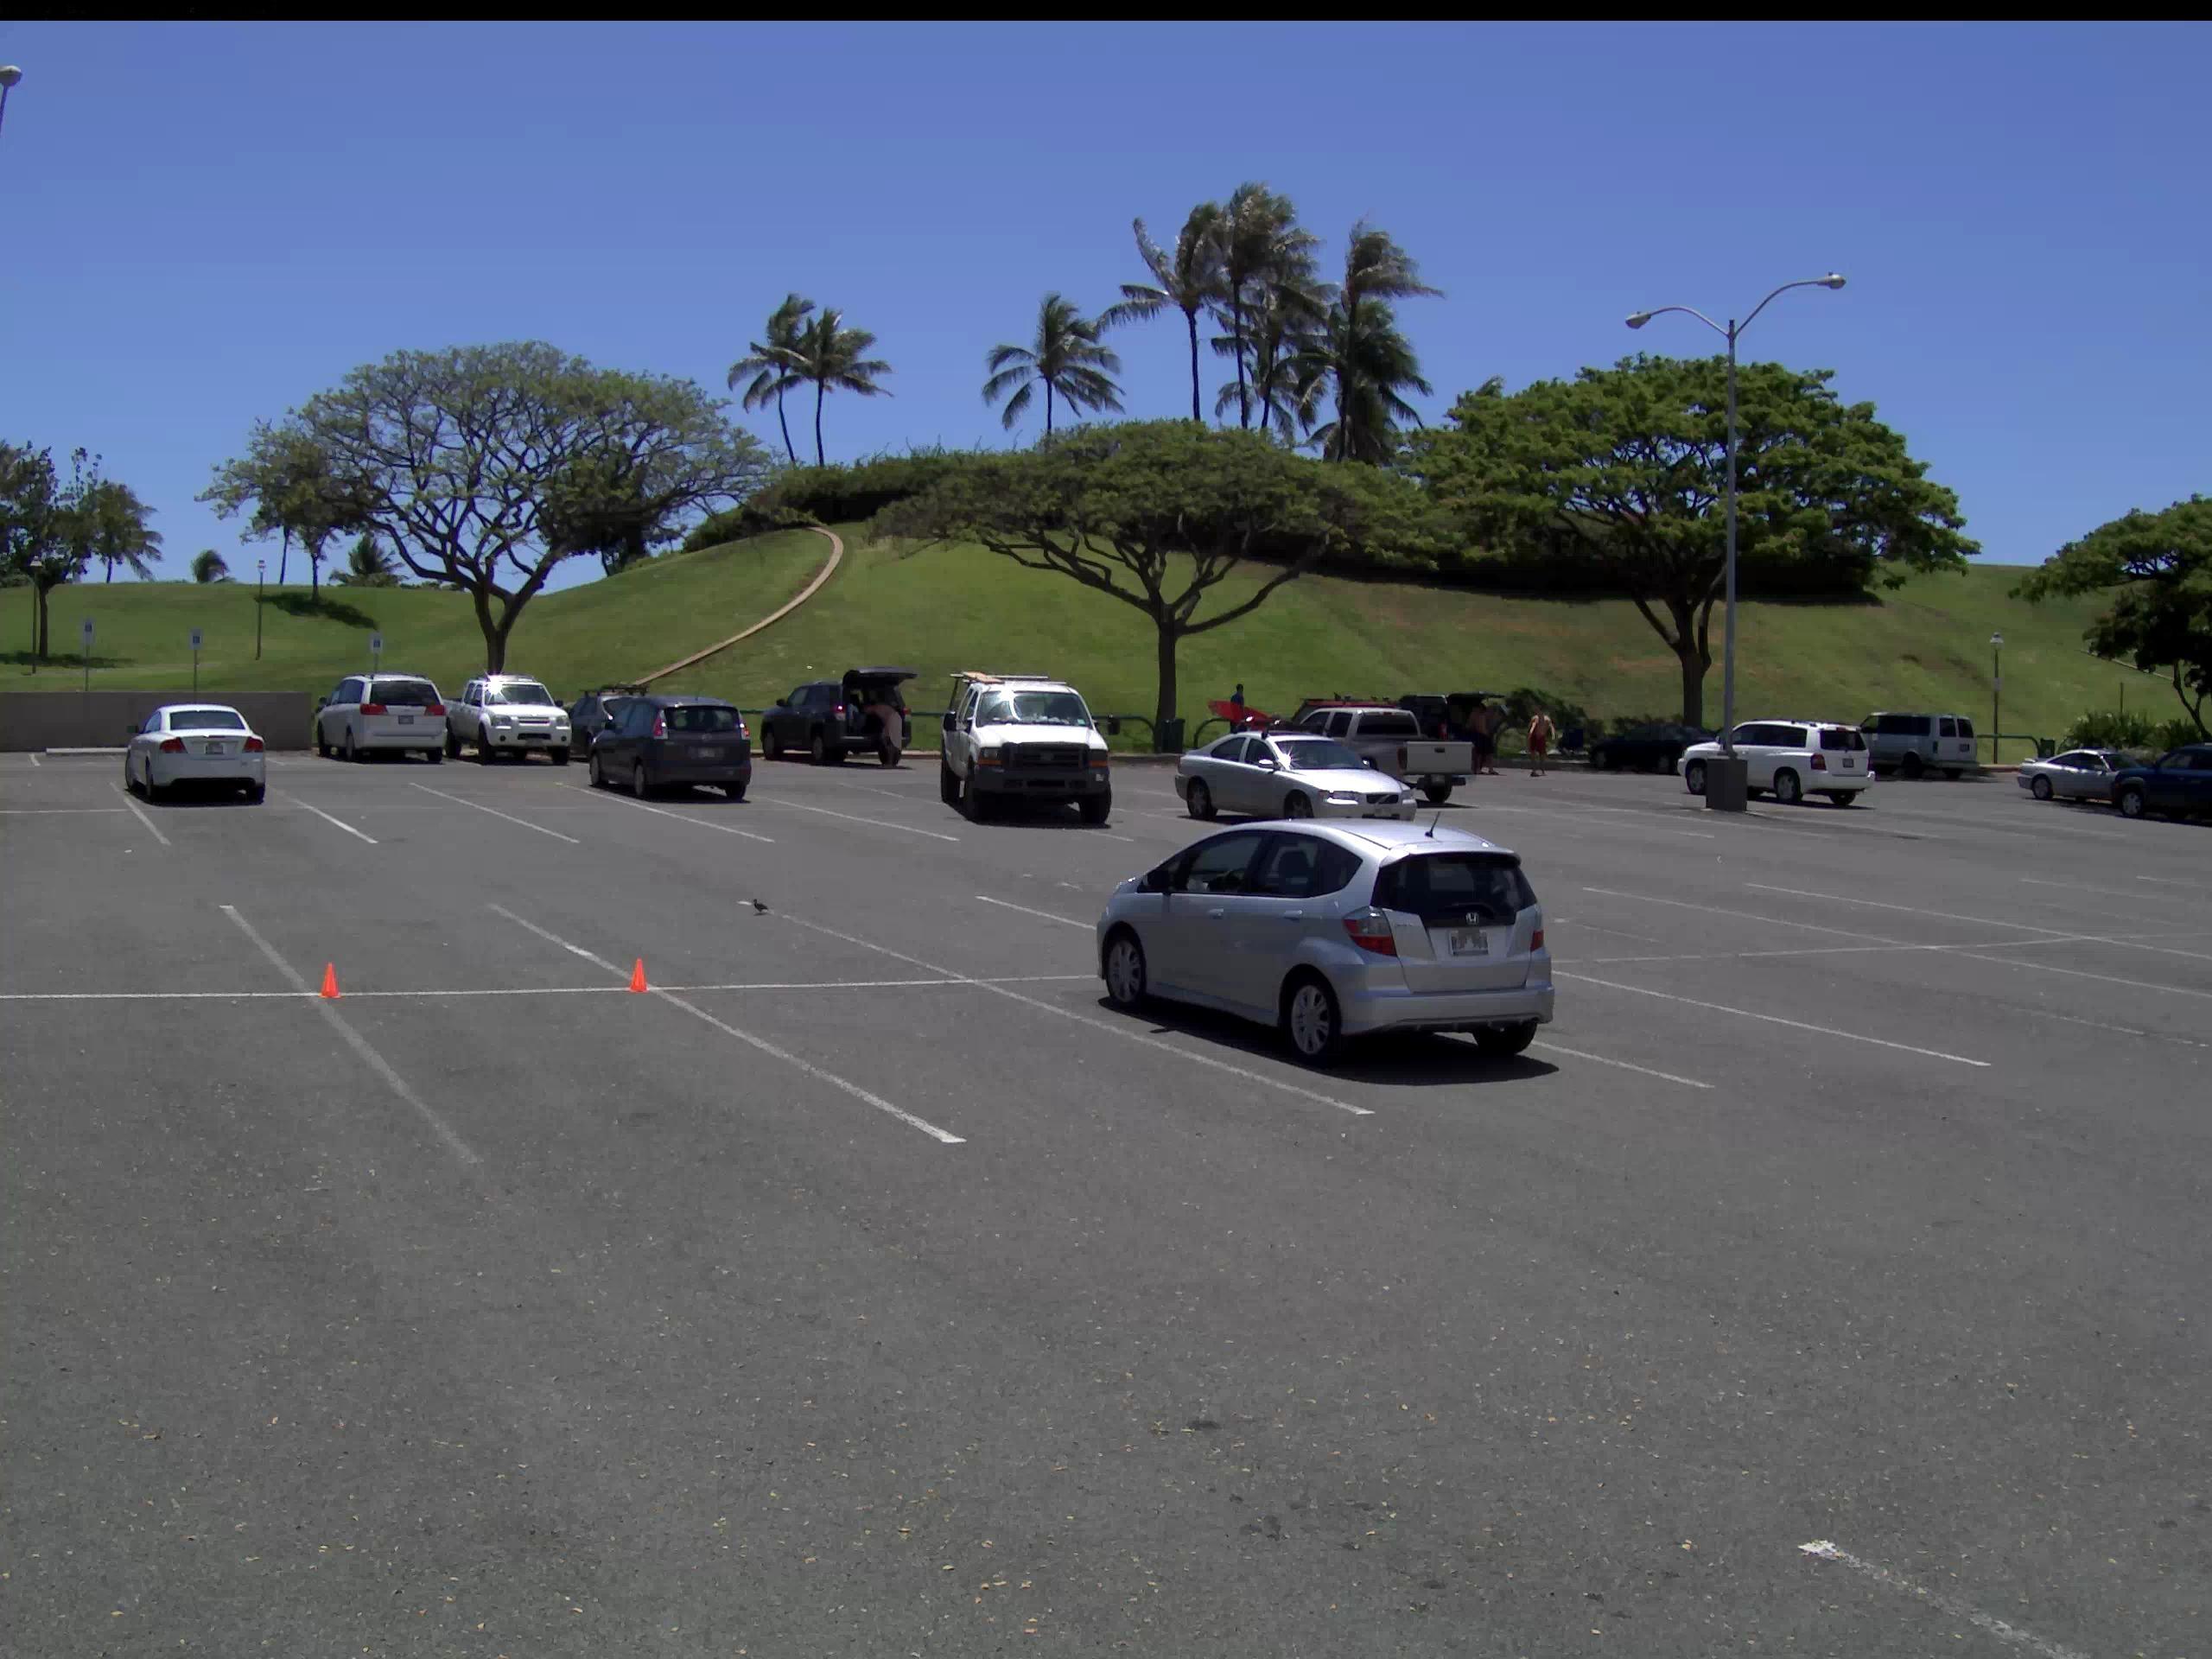 Parking Lot Shootout Light Pole Wiring Diagram